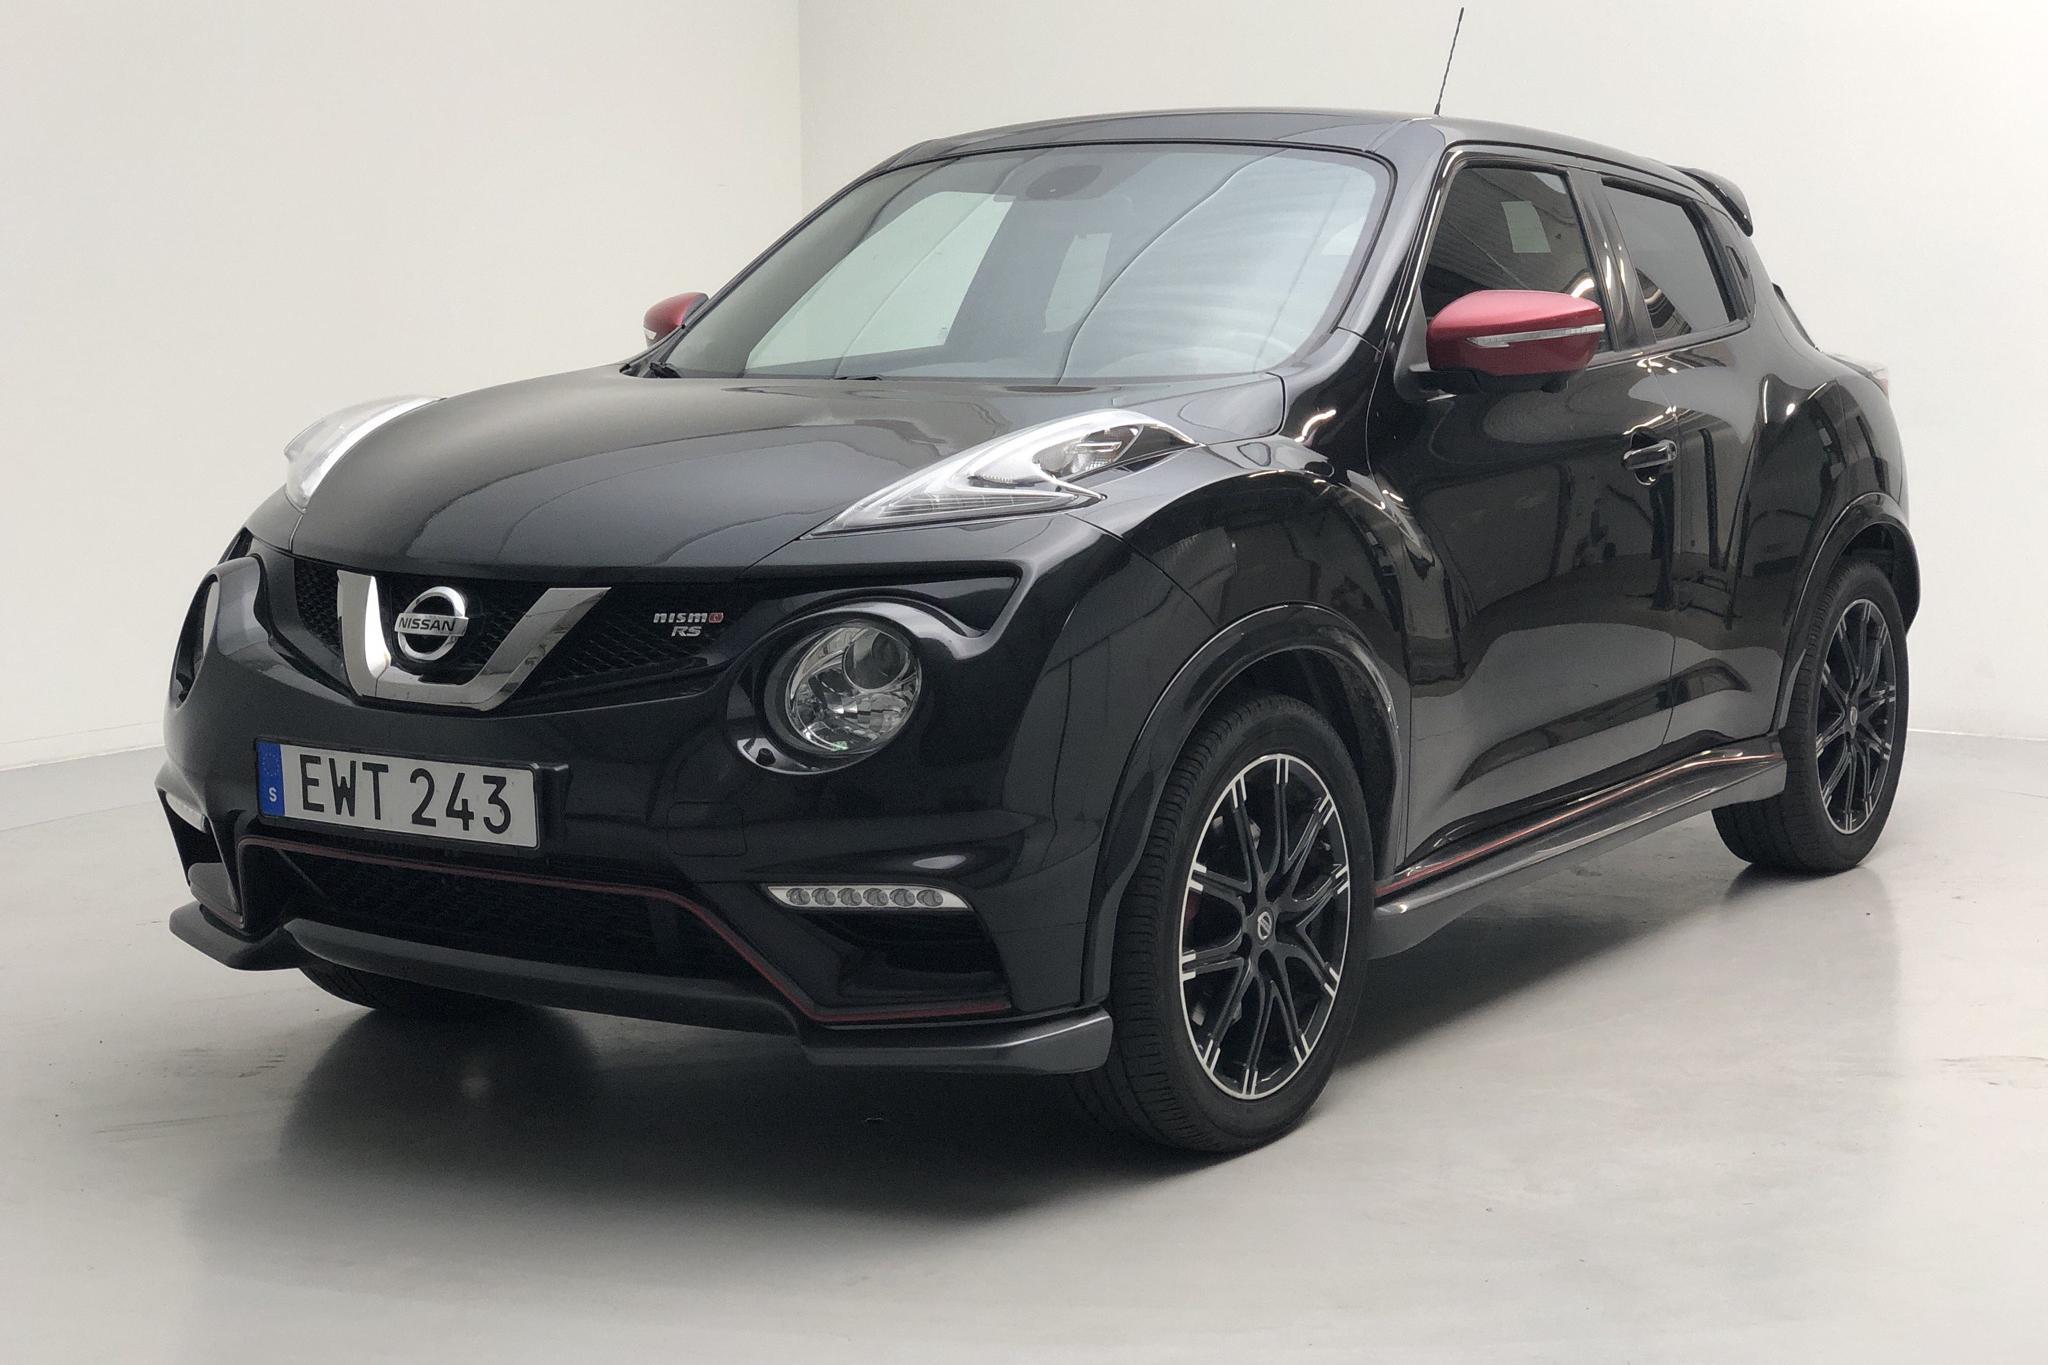 Nissan Juke 1.6 4WD (214hk) - 7 062 mil - Automat - svart - 2015